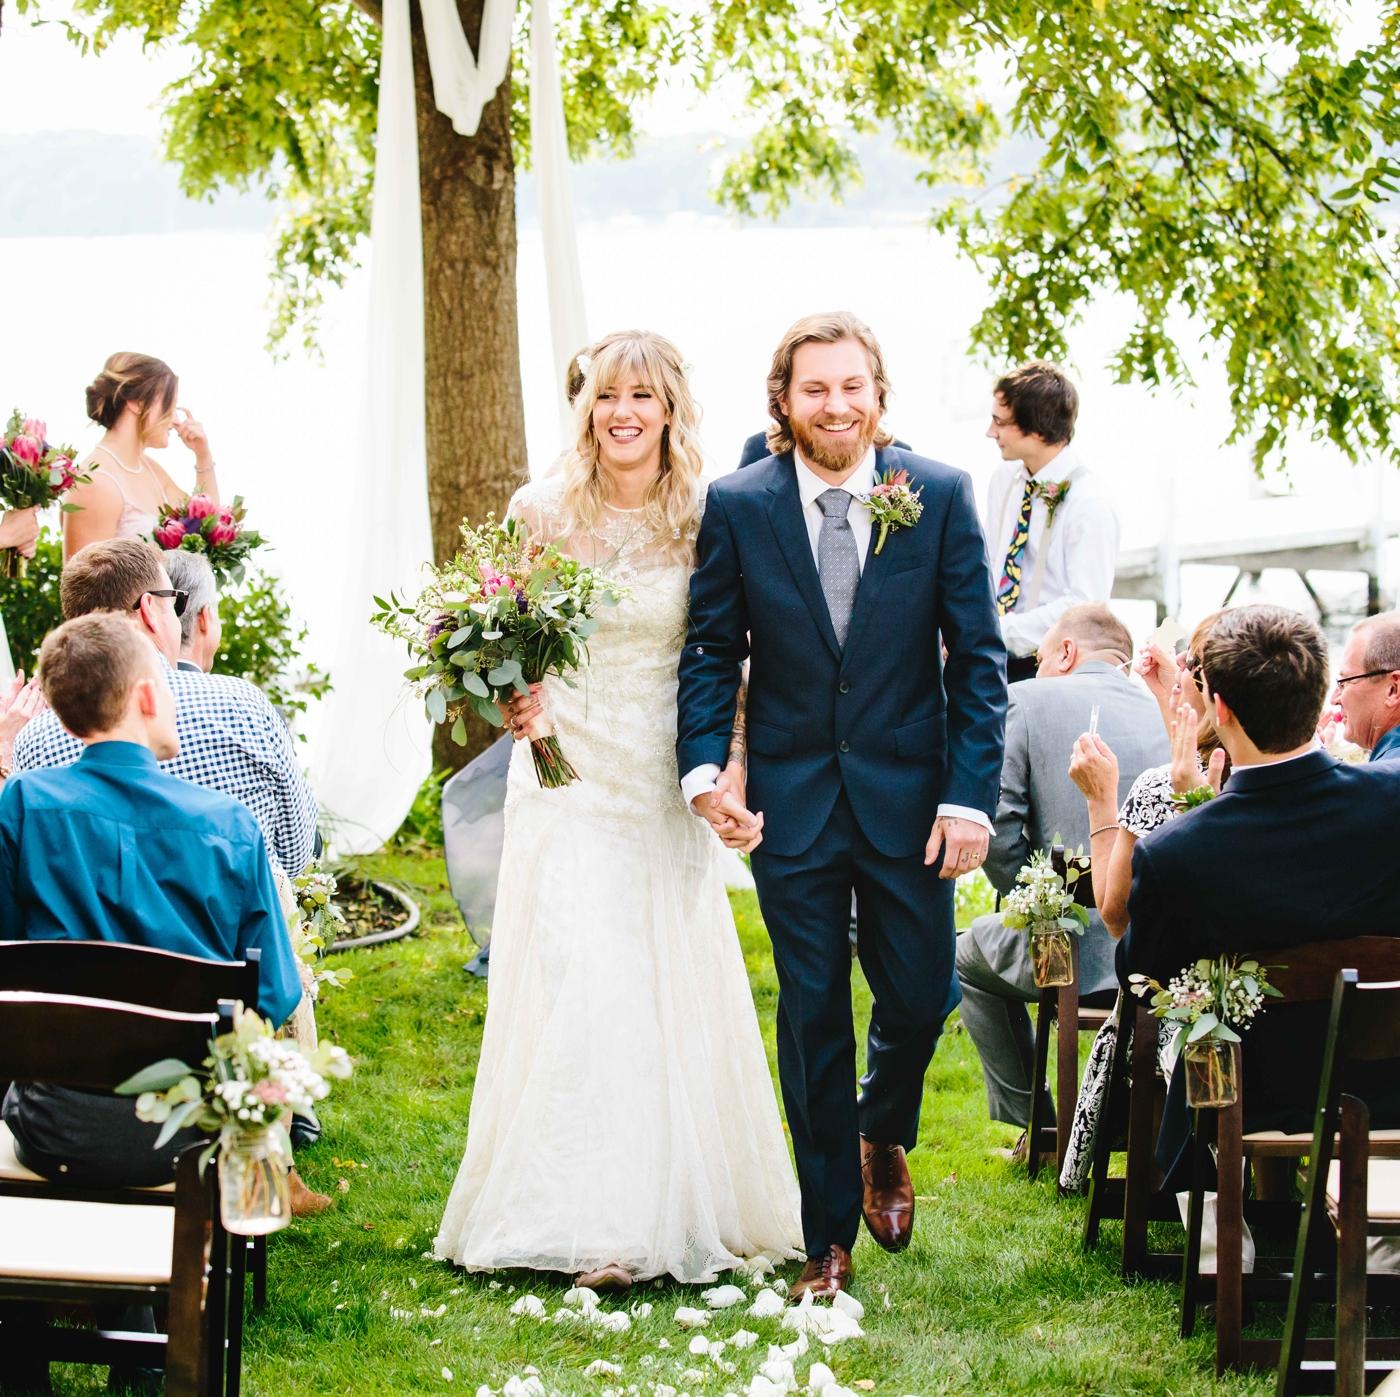 chicago-fine-art-wedding-photography-chriskelsey18